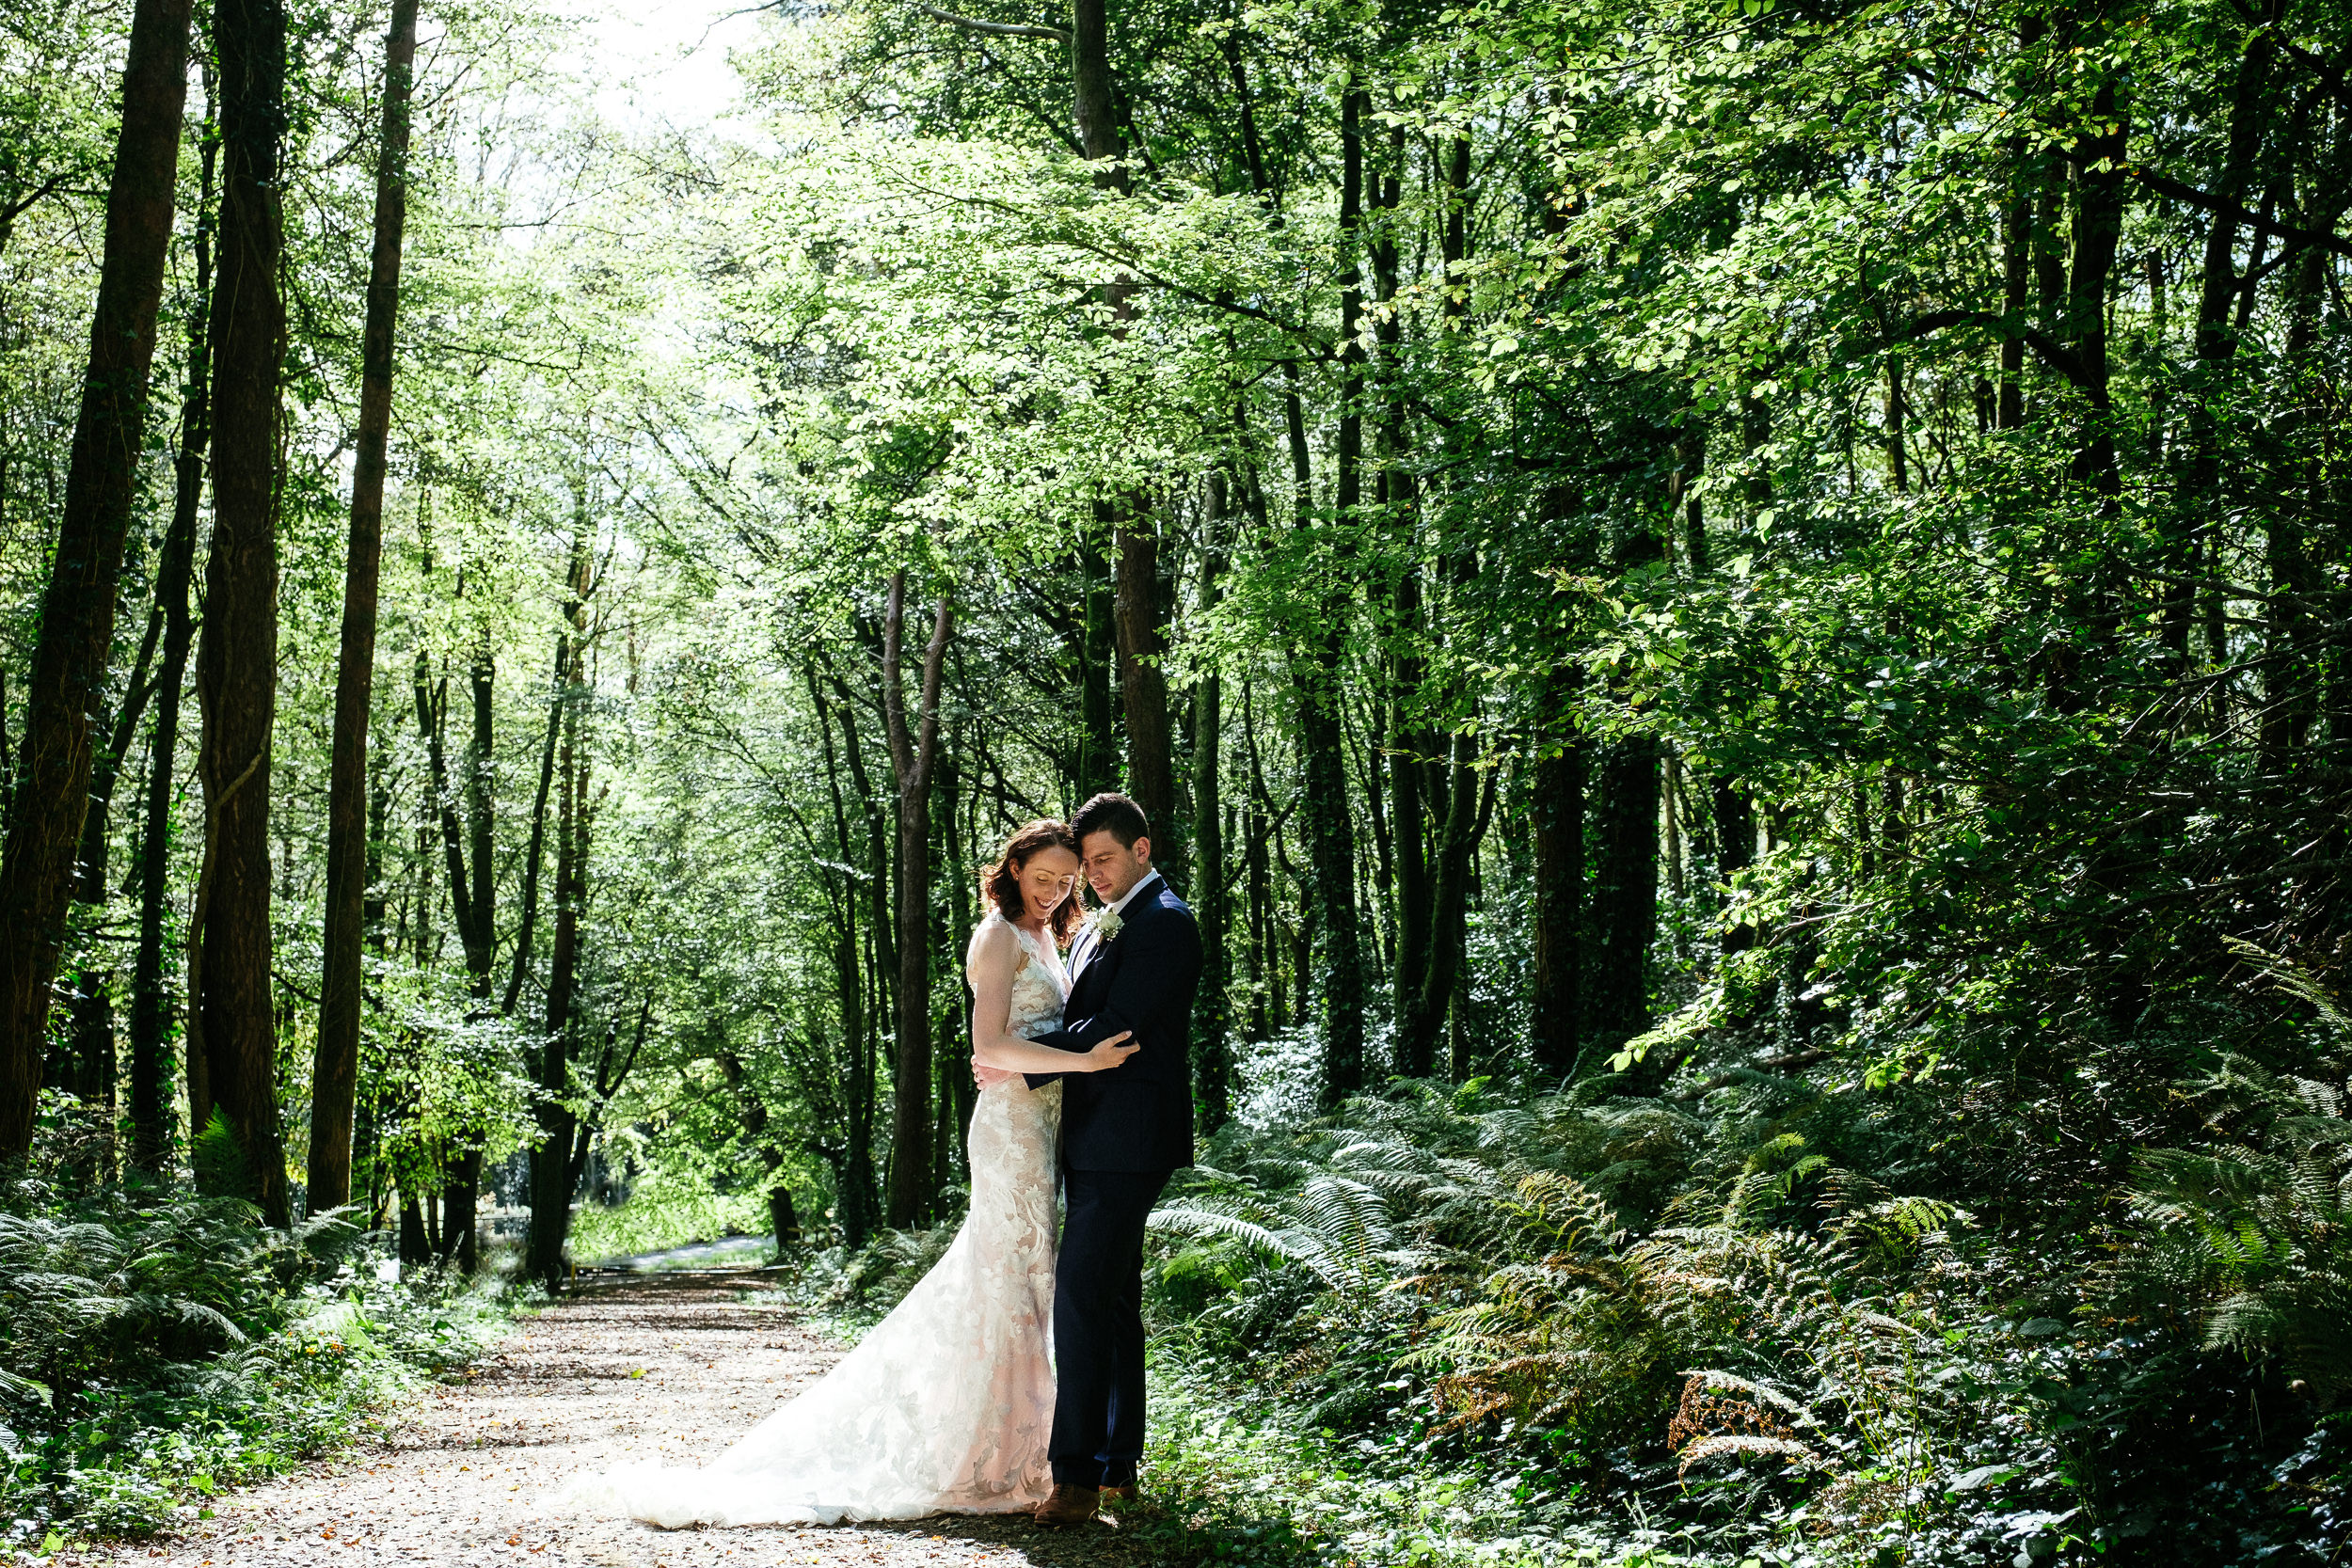 Dunmore House Hotel Clonakilty Cork Wedding Photographer 63